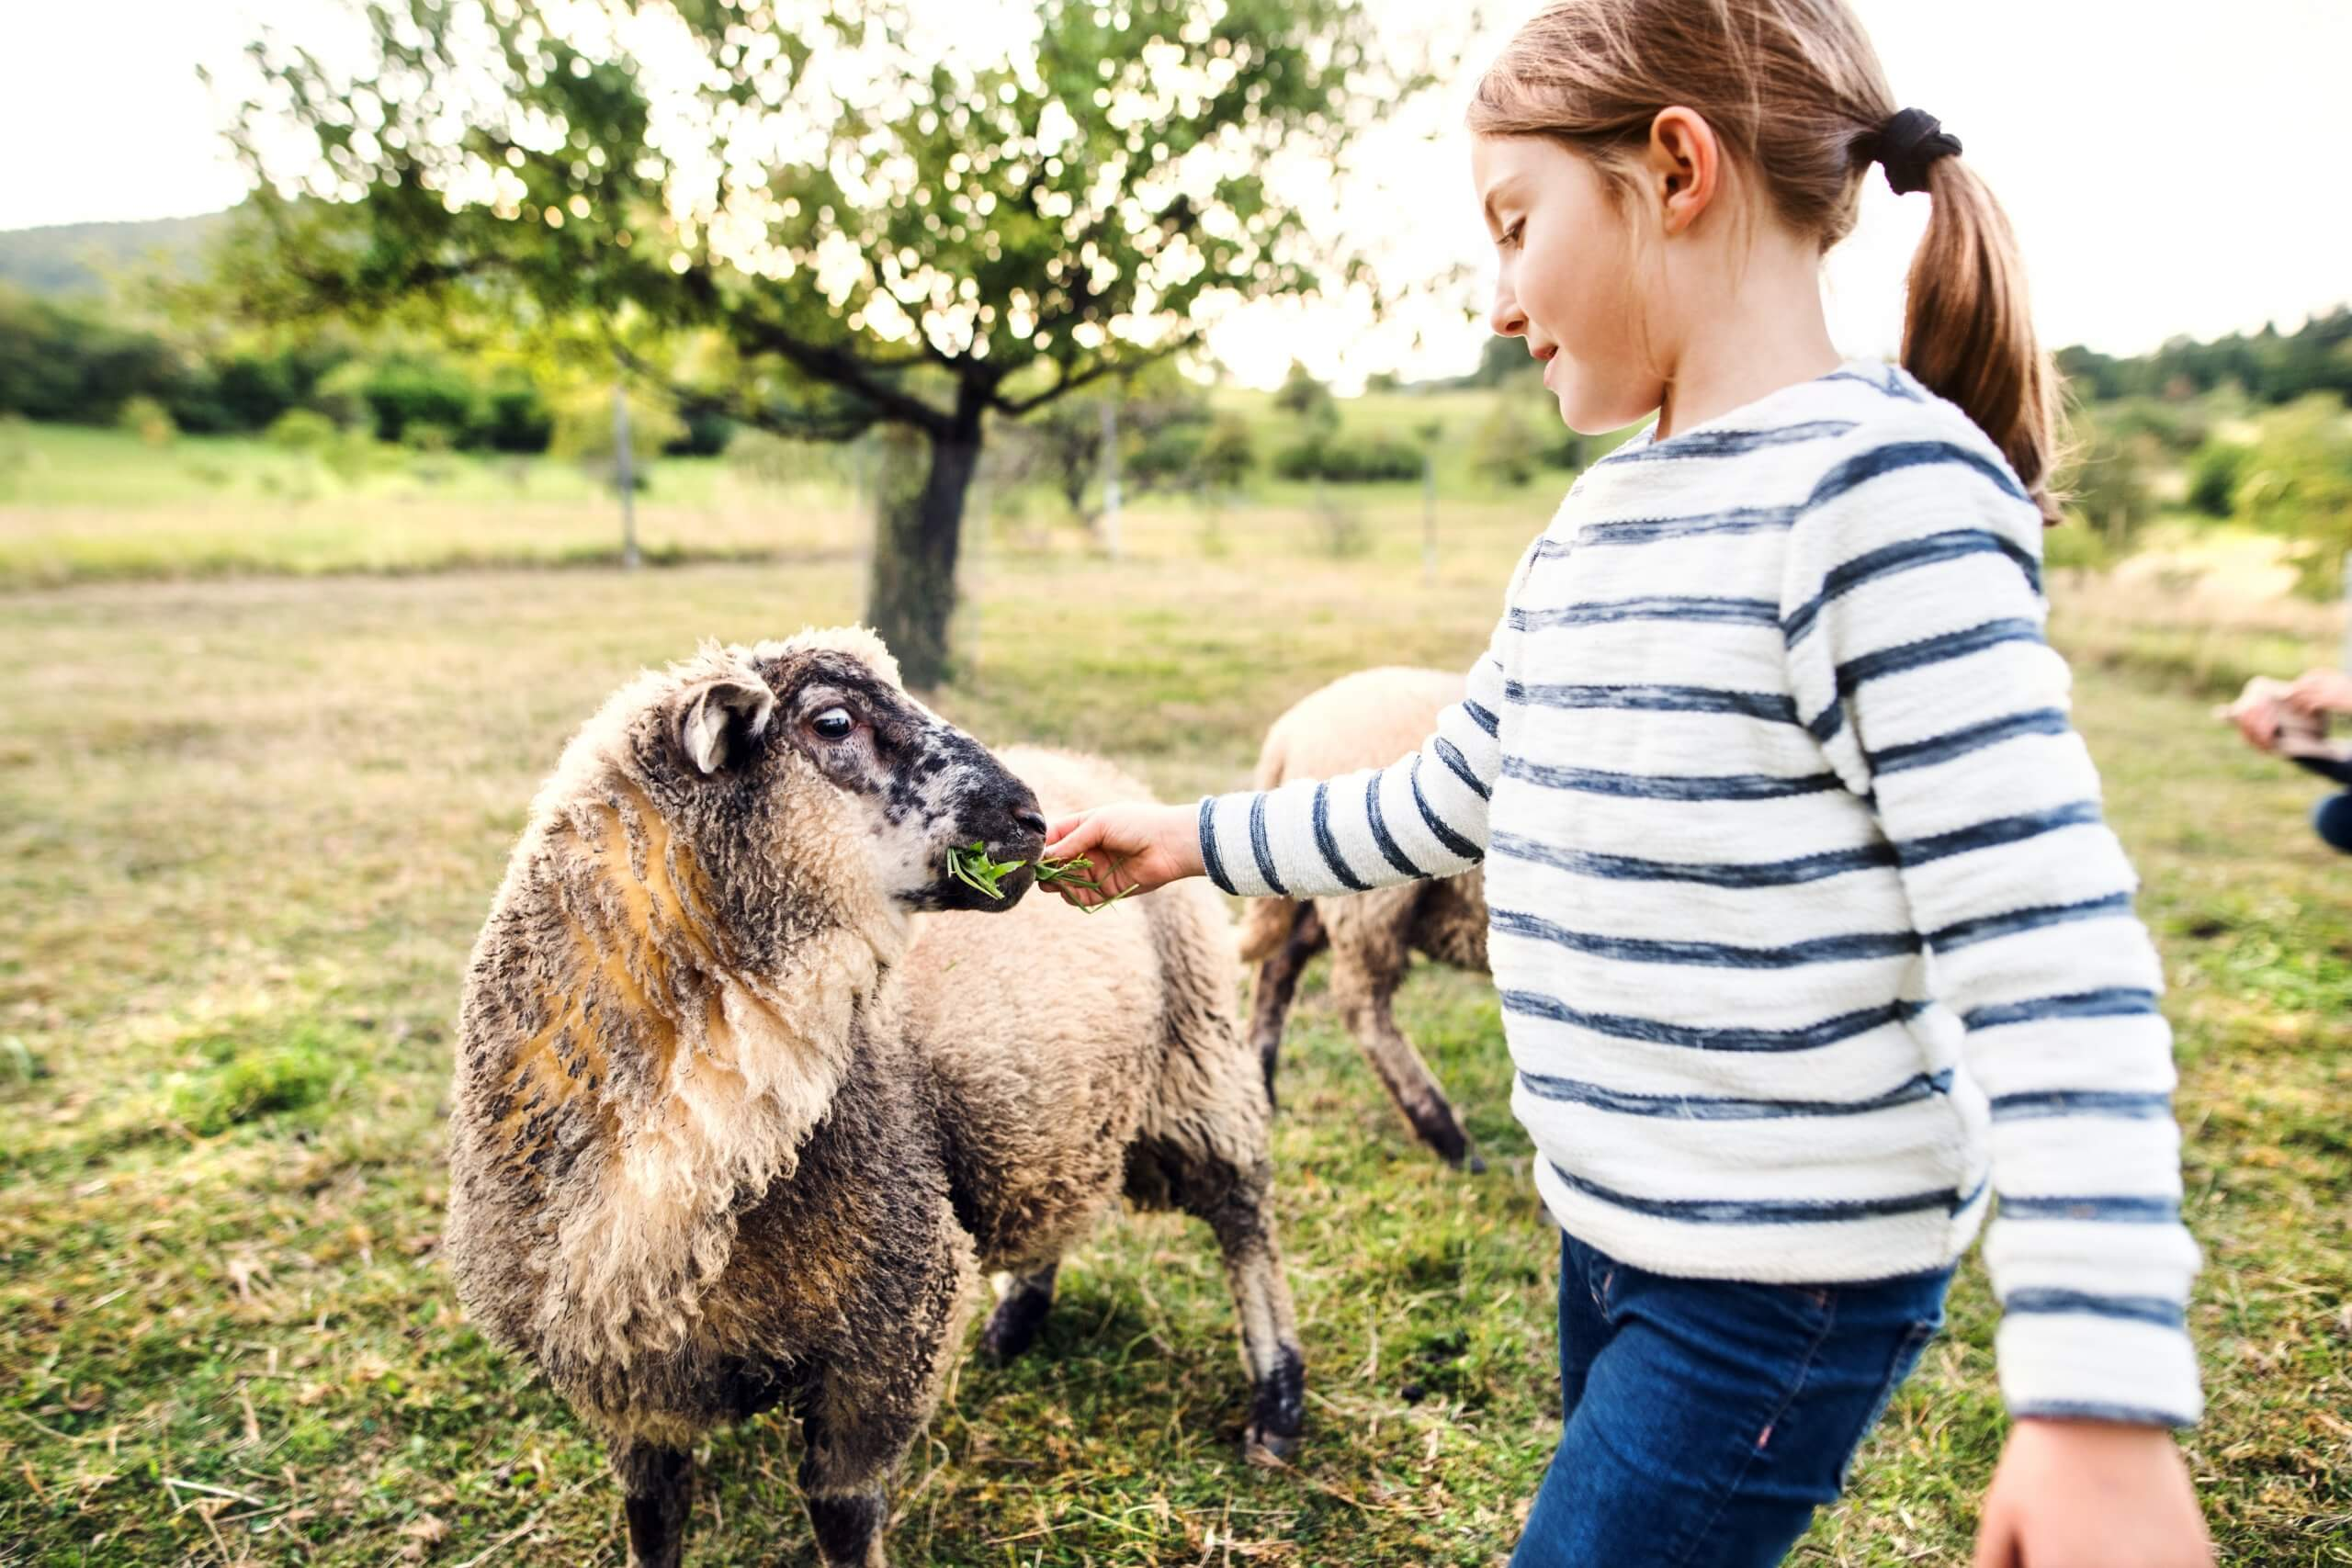 Niña alimentando a una oveja